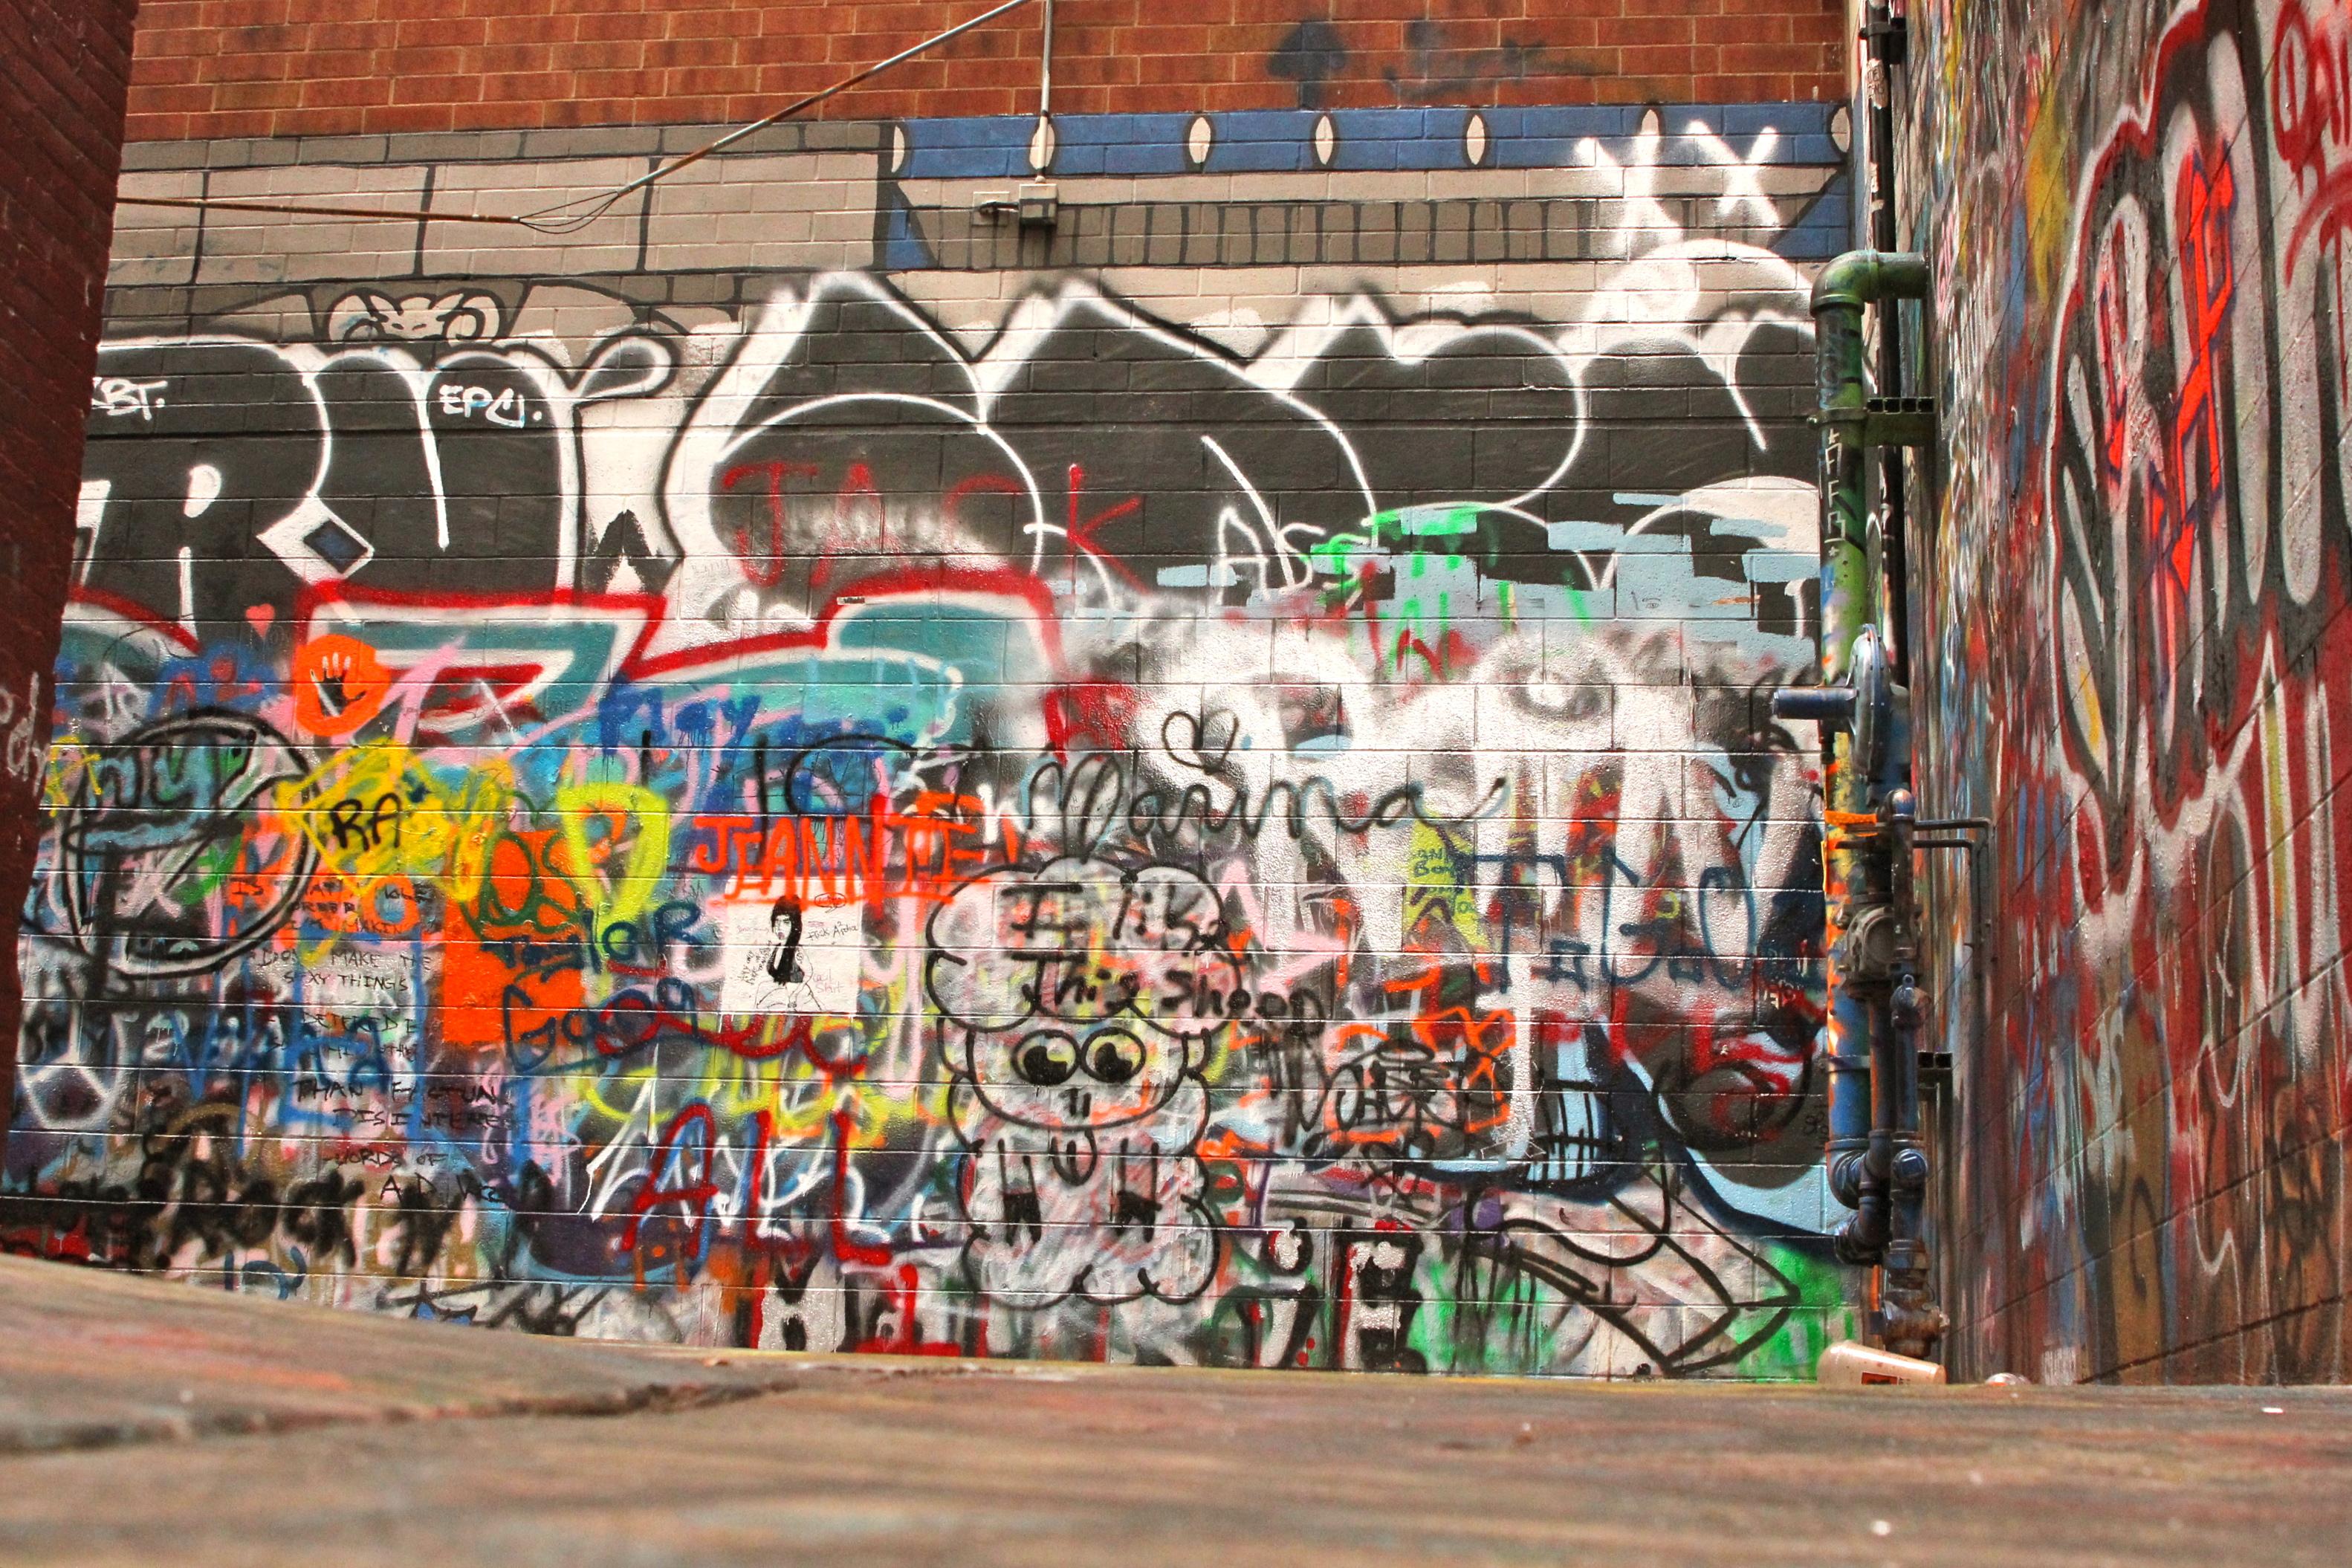 Graffiti wall ann arbor - I